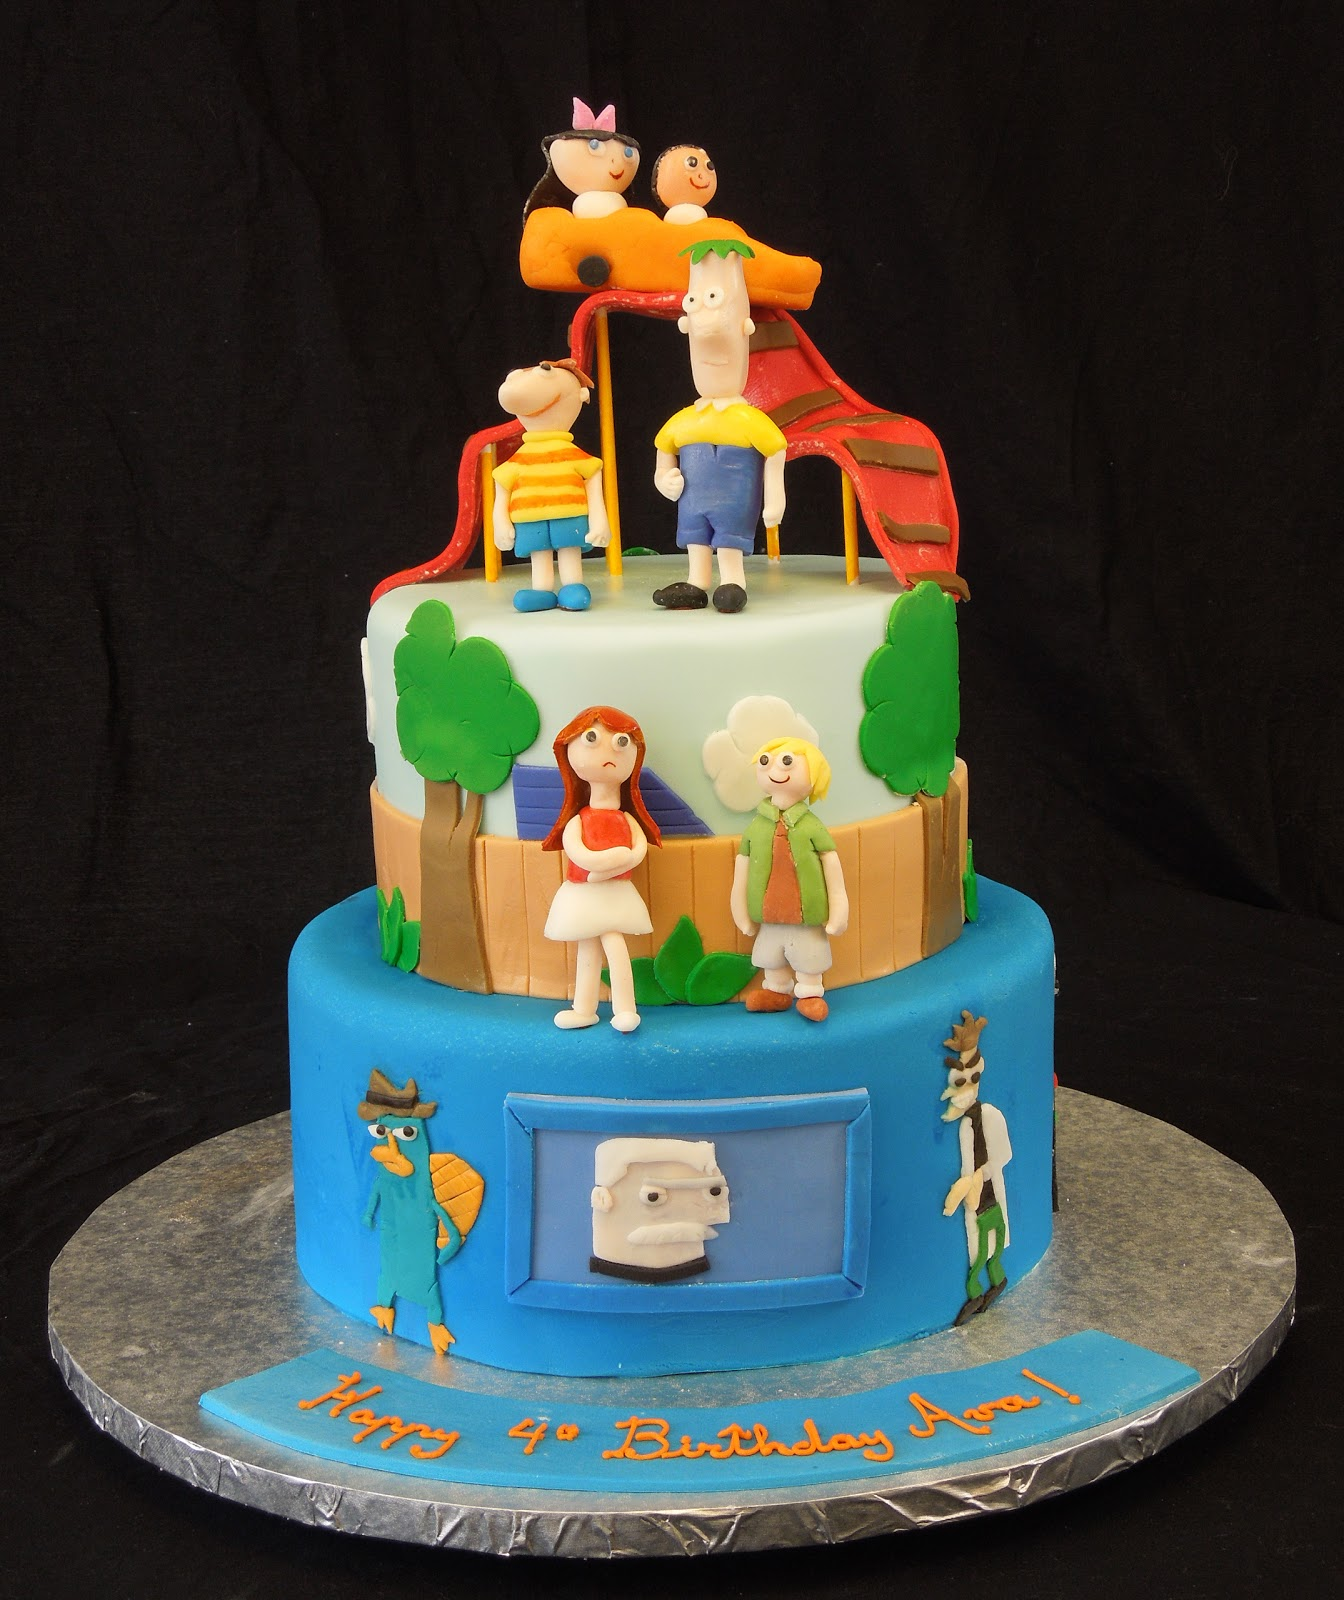 http://1.bp.blogspot.com/-rJhPUW26tdY/UF-uHUM_uzI/AAAAAAAAA08/Q8S_Kp2jBWo/s1600/Phineas+and+Ferb+Birthday+Cake.jpg